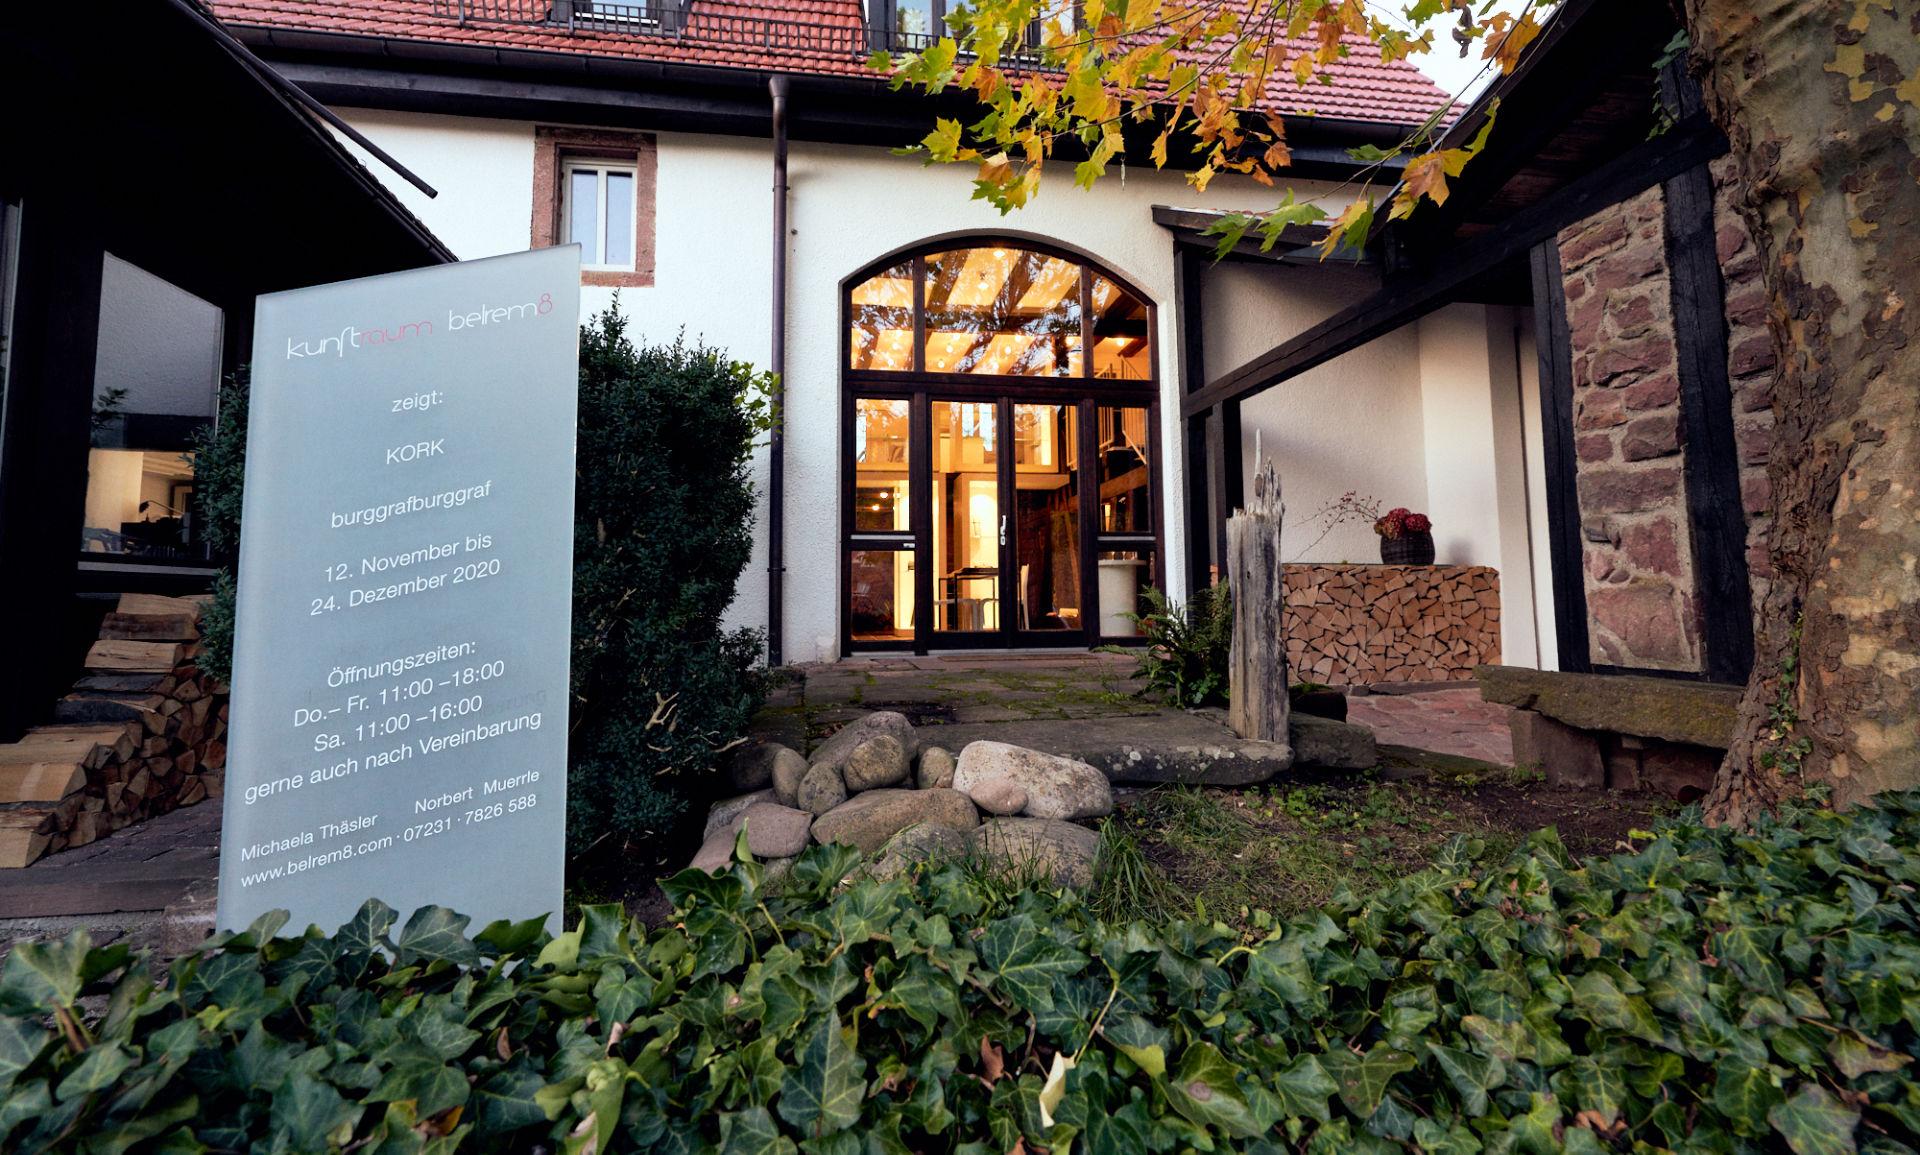 burggrafburggraf-belrem8-pforzheim-ausstellung-kork